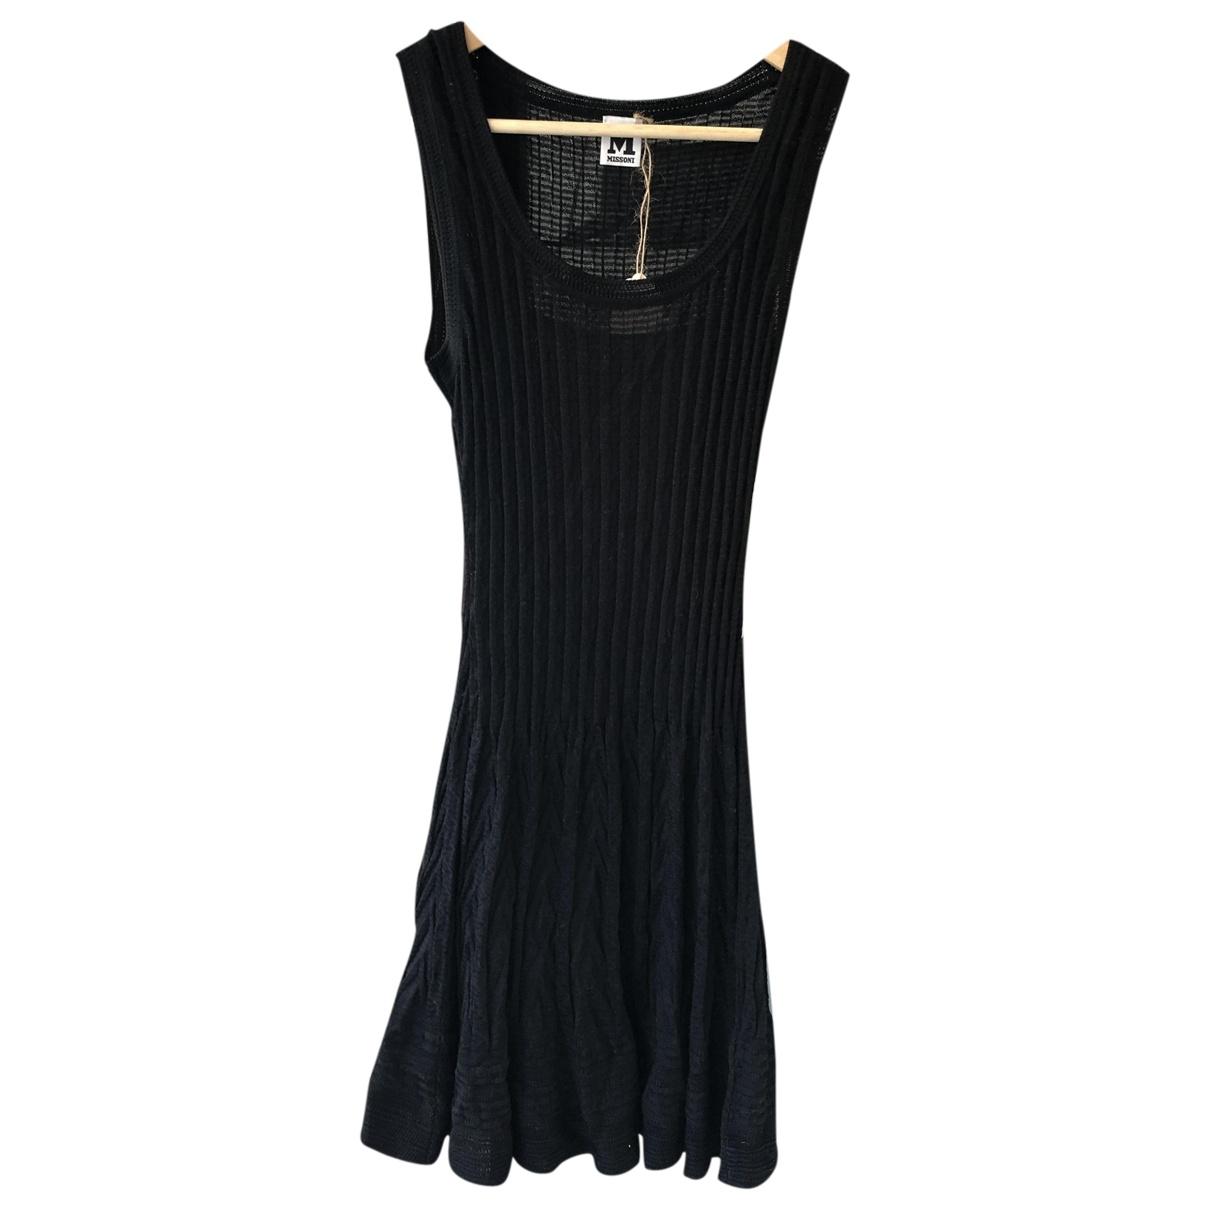 M Missoni \N Black Cotton dress for Women 40 IT